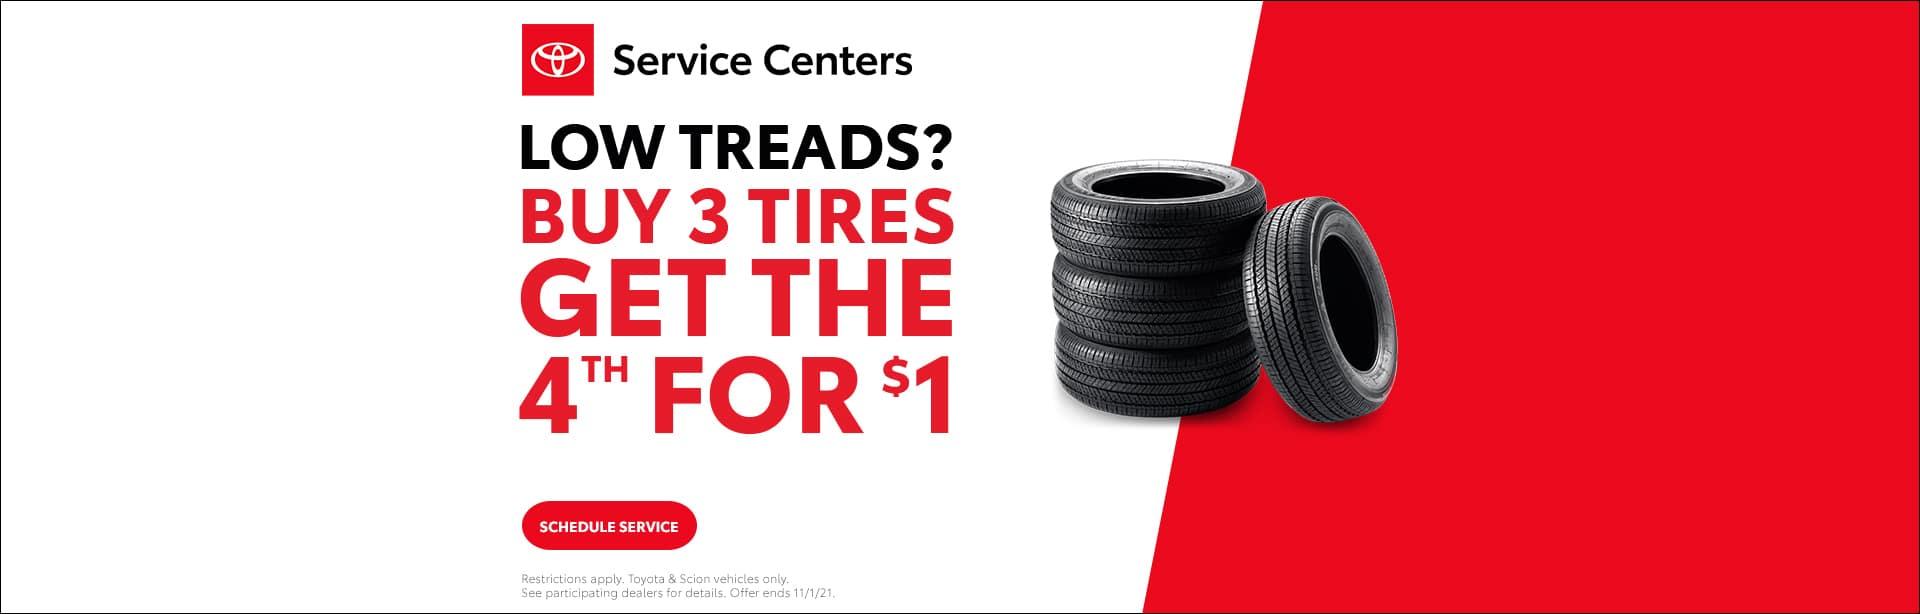 10-21_01_All-TDAs-September-2021-NAT-Buy-3-Tires_1920x614_4e89_All-Models_R_xta